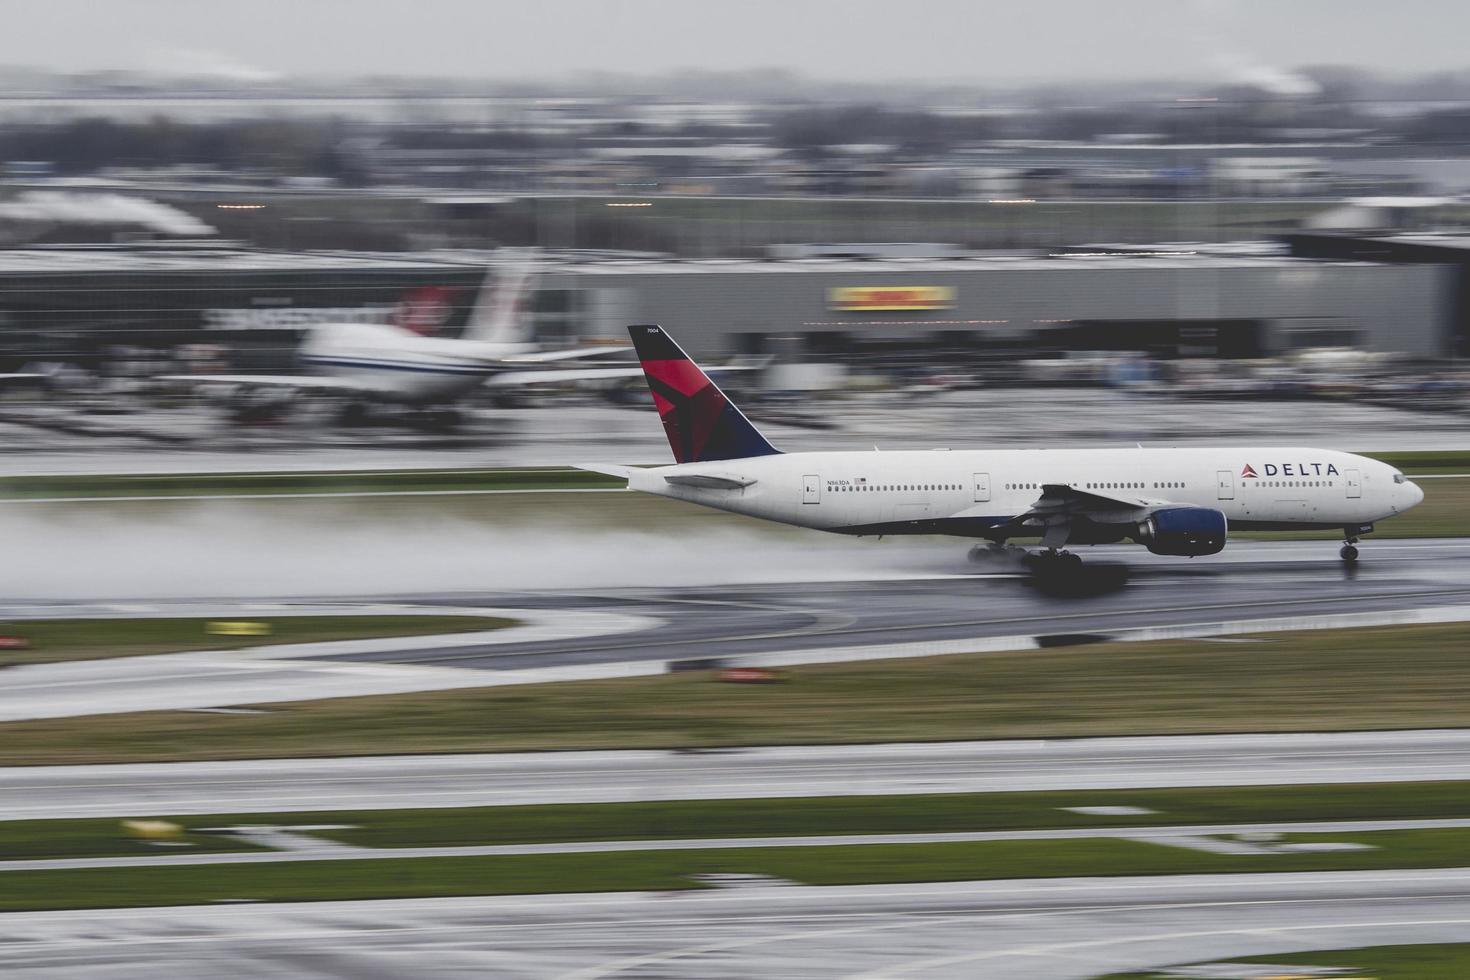 Netherlands, 2013-Delta plane lands at Amsterdam Airport Schiphol photo